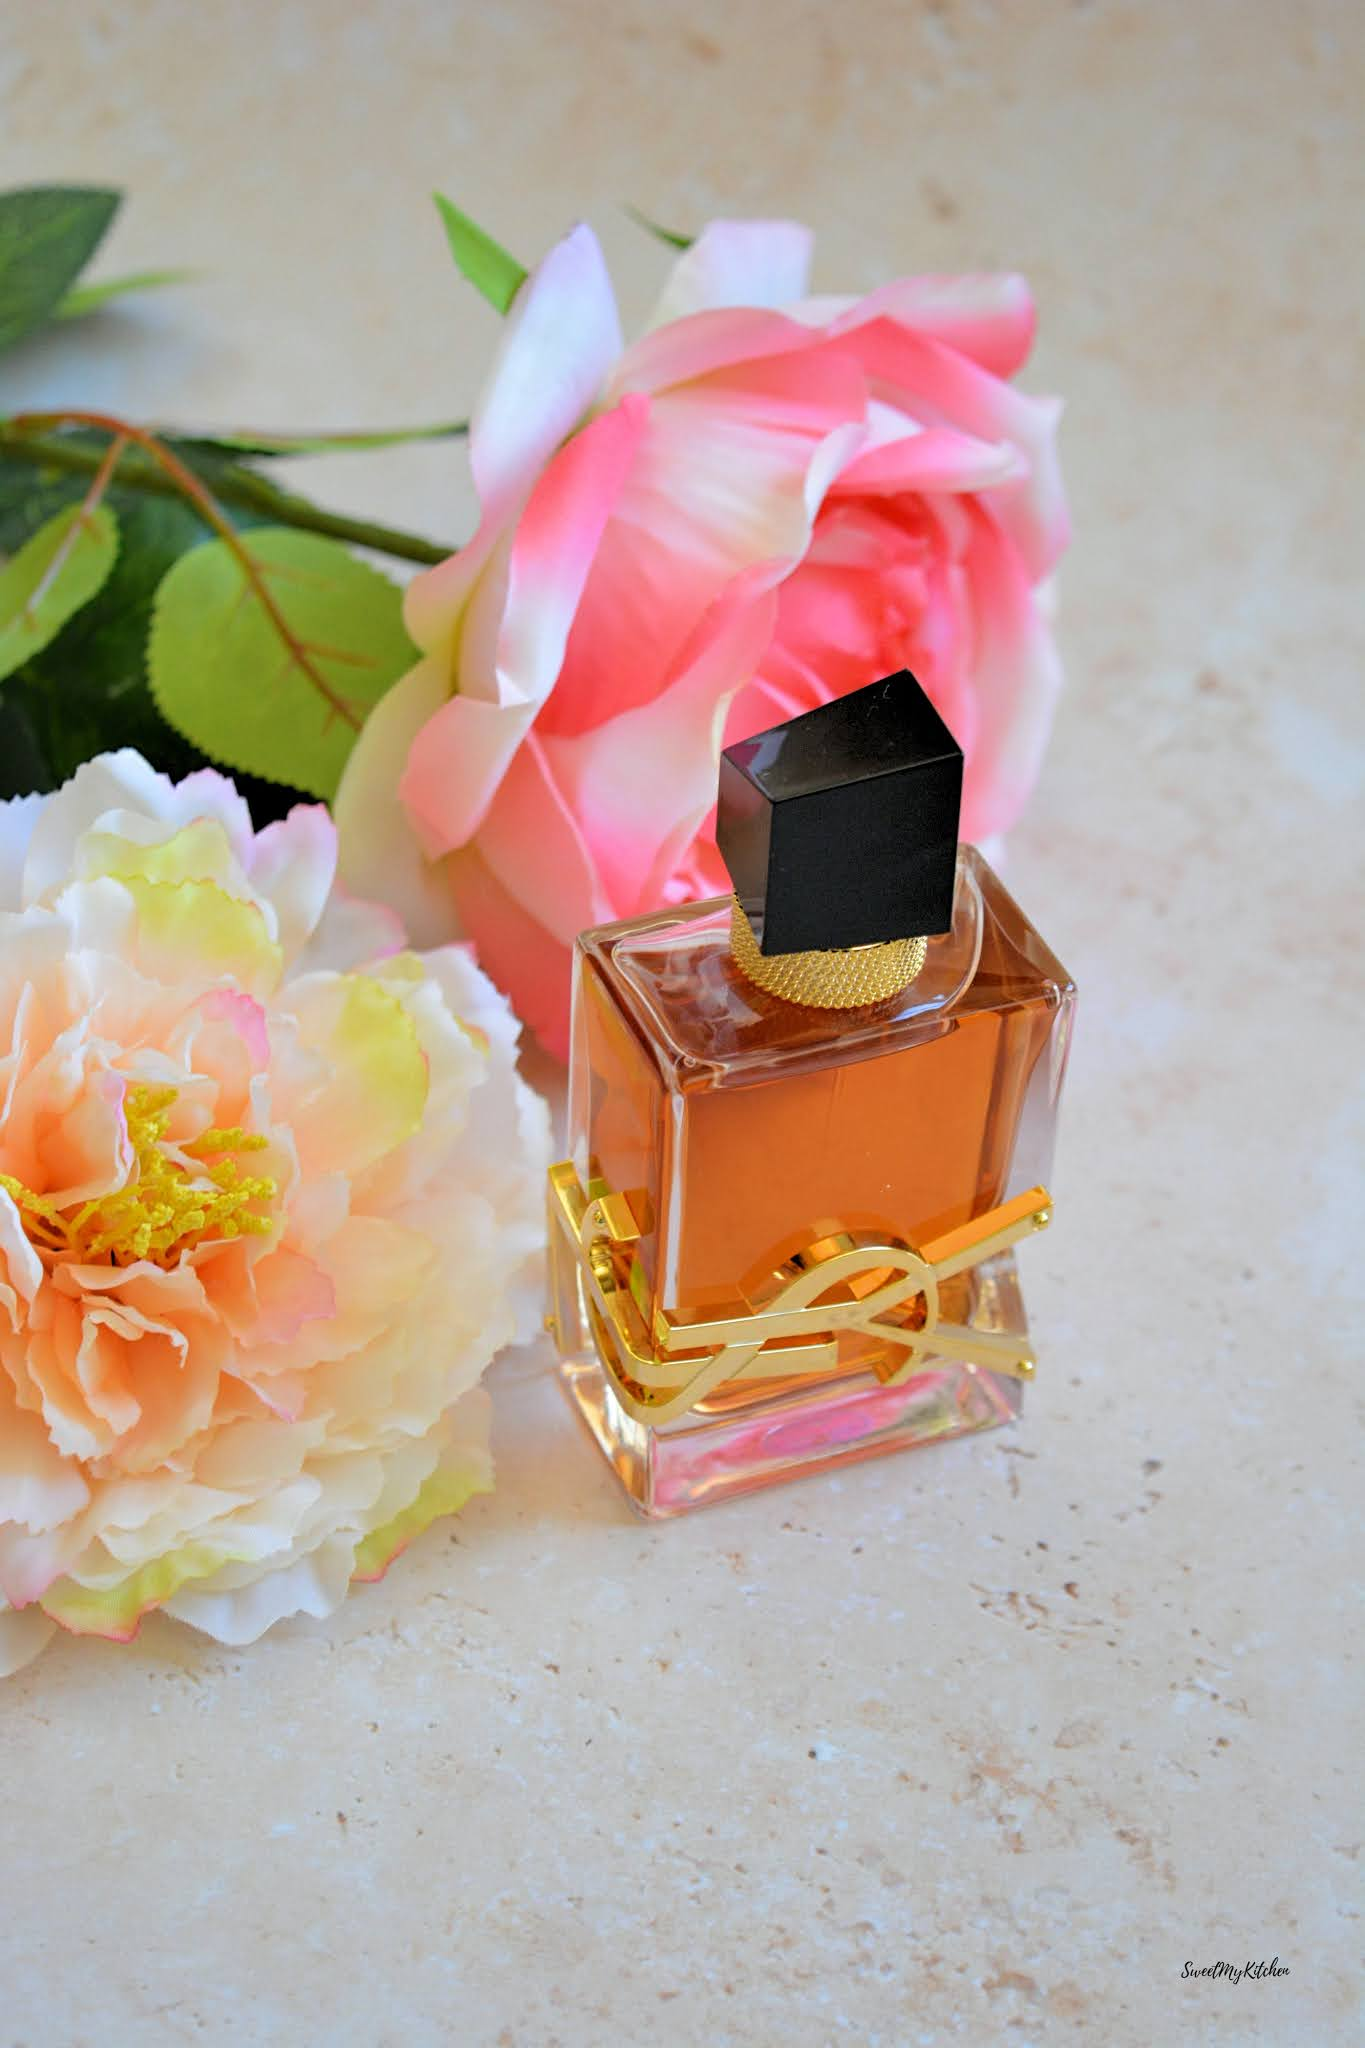 YEL Libre Intense parfum review